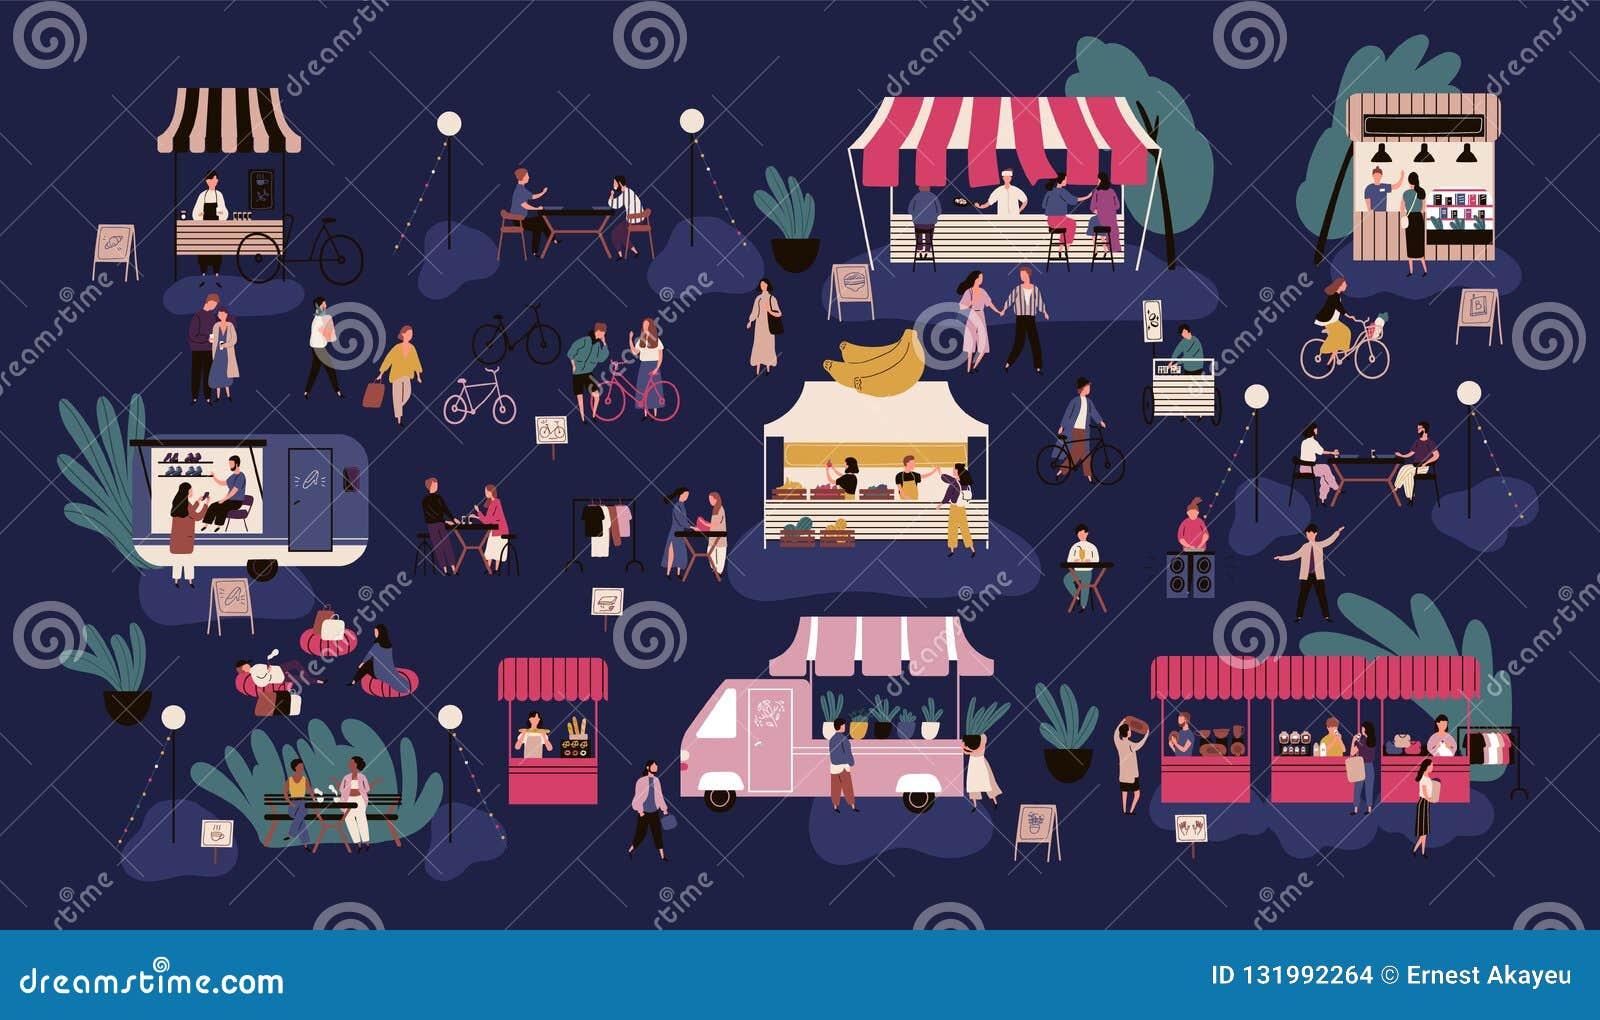 Night market or nighttime outdoor fair. Men and women walking between stalls or kiosks, buying goods, eating street food